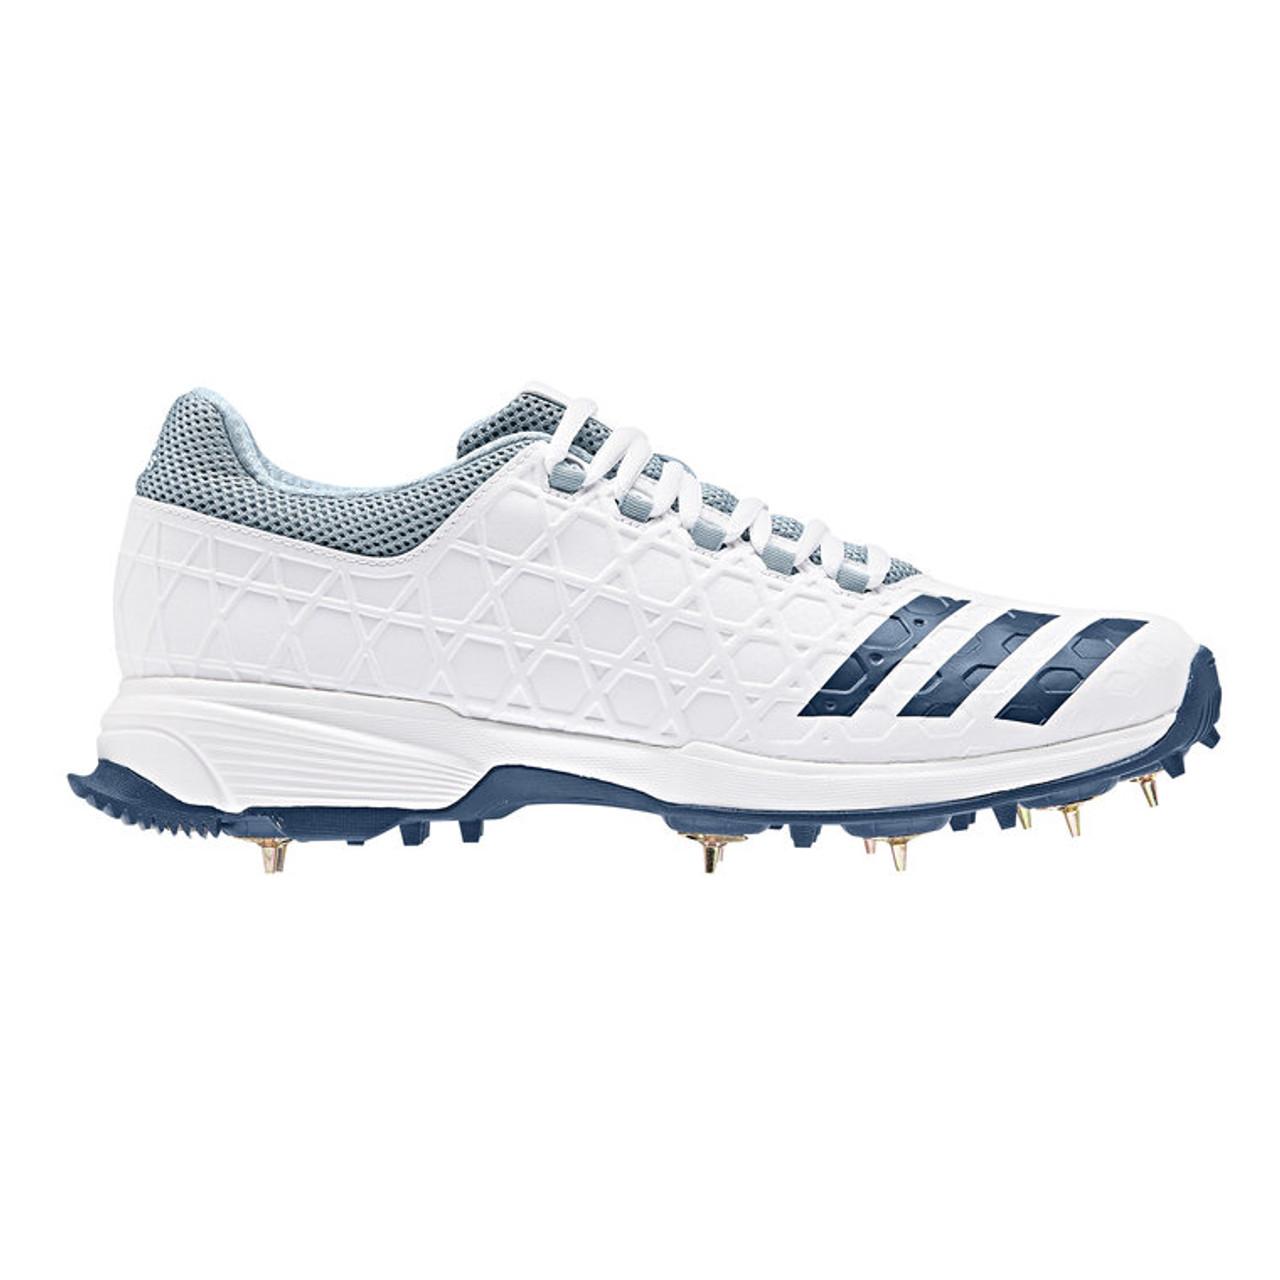 Adidas SL22 Cricket Shoes 2019